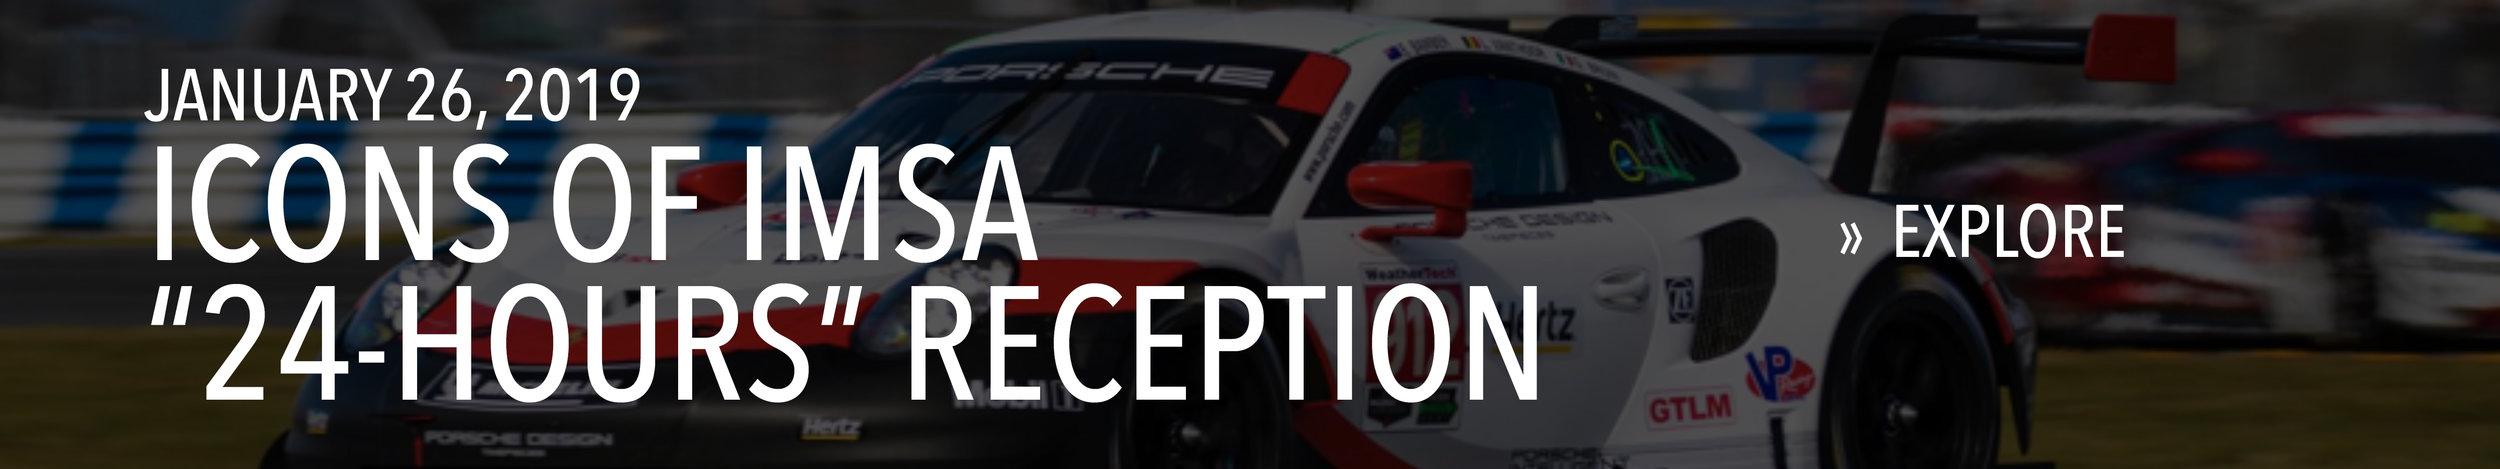 "Icons of IMSA ""24 Hours"" Reception on January 26, 2019."